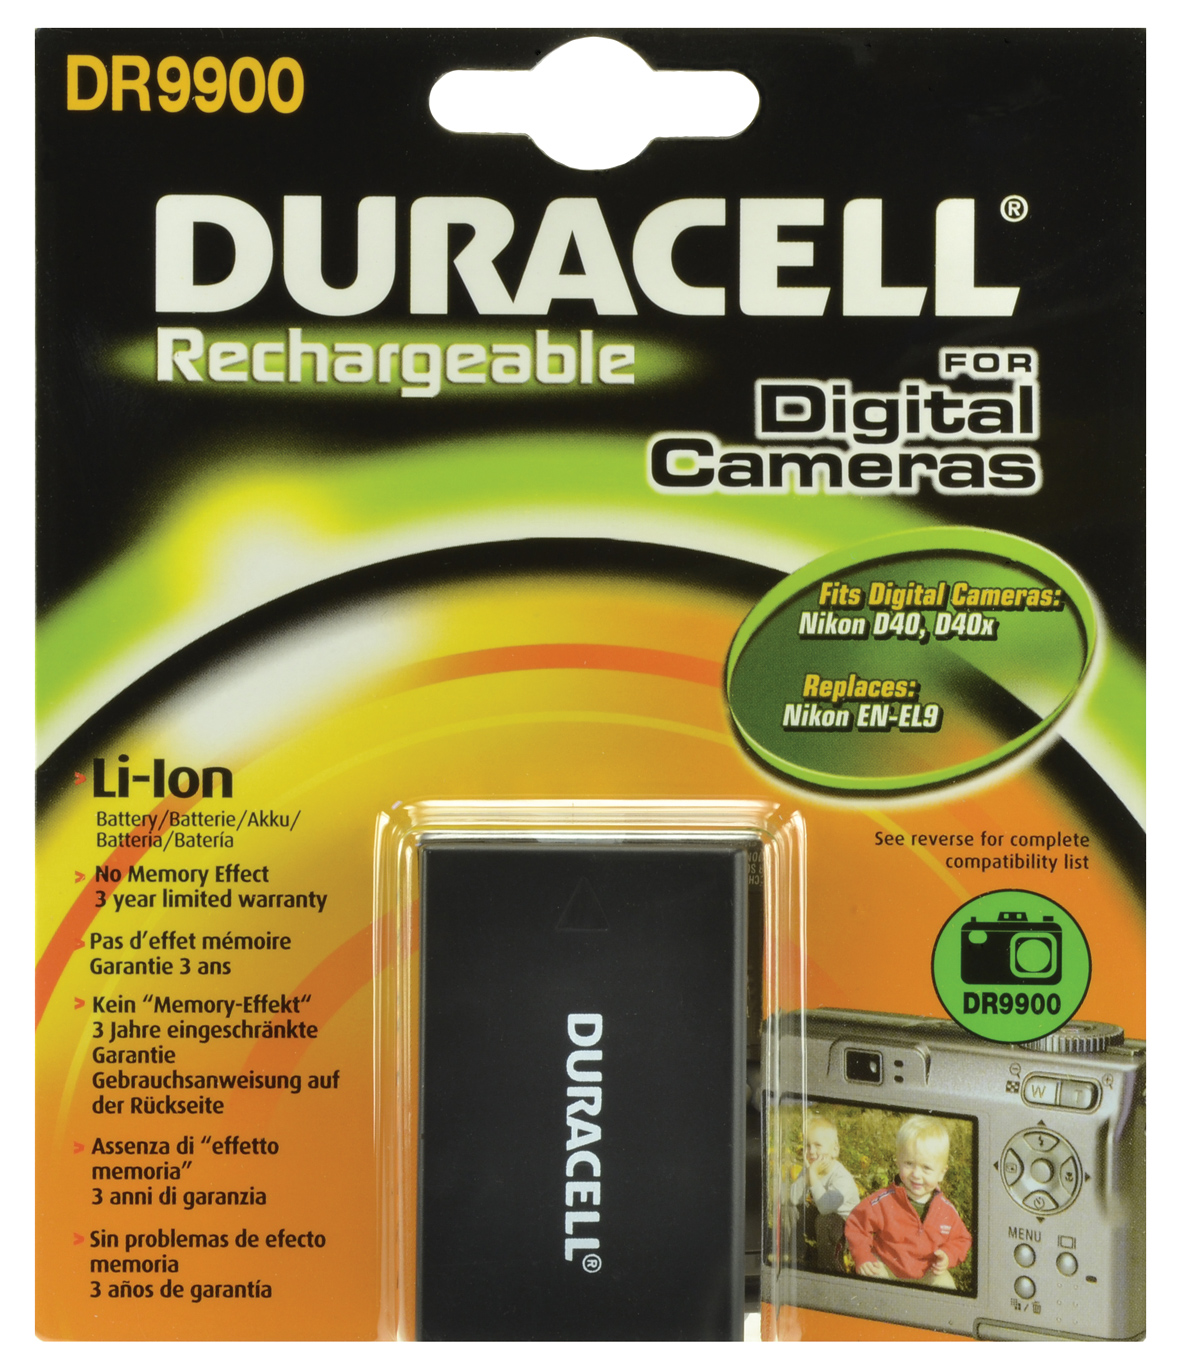 Baterie do fotoaparátu Nikon D3000/D40/D40x/D5000/D60, 1050mAh, 7.4V, DR9900, blistr